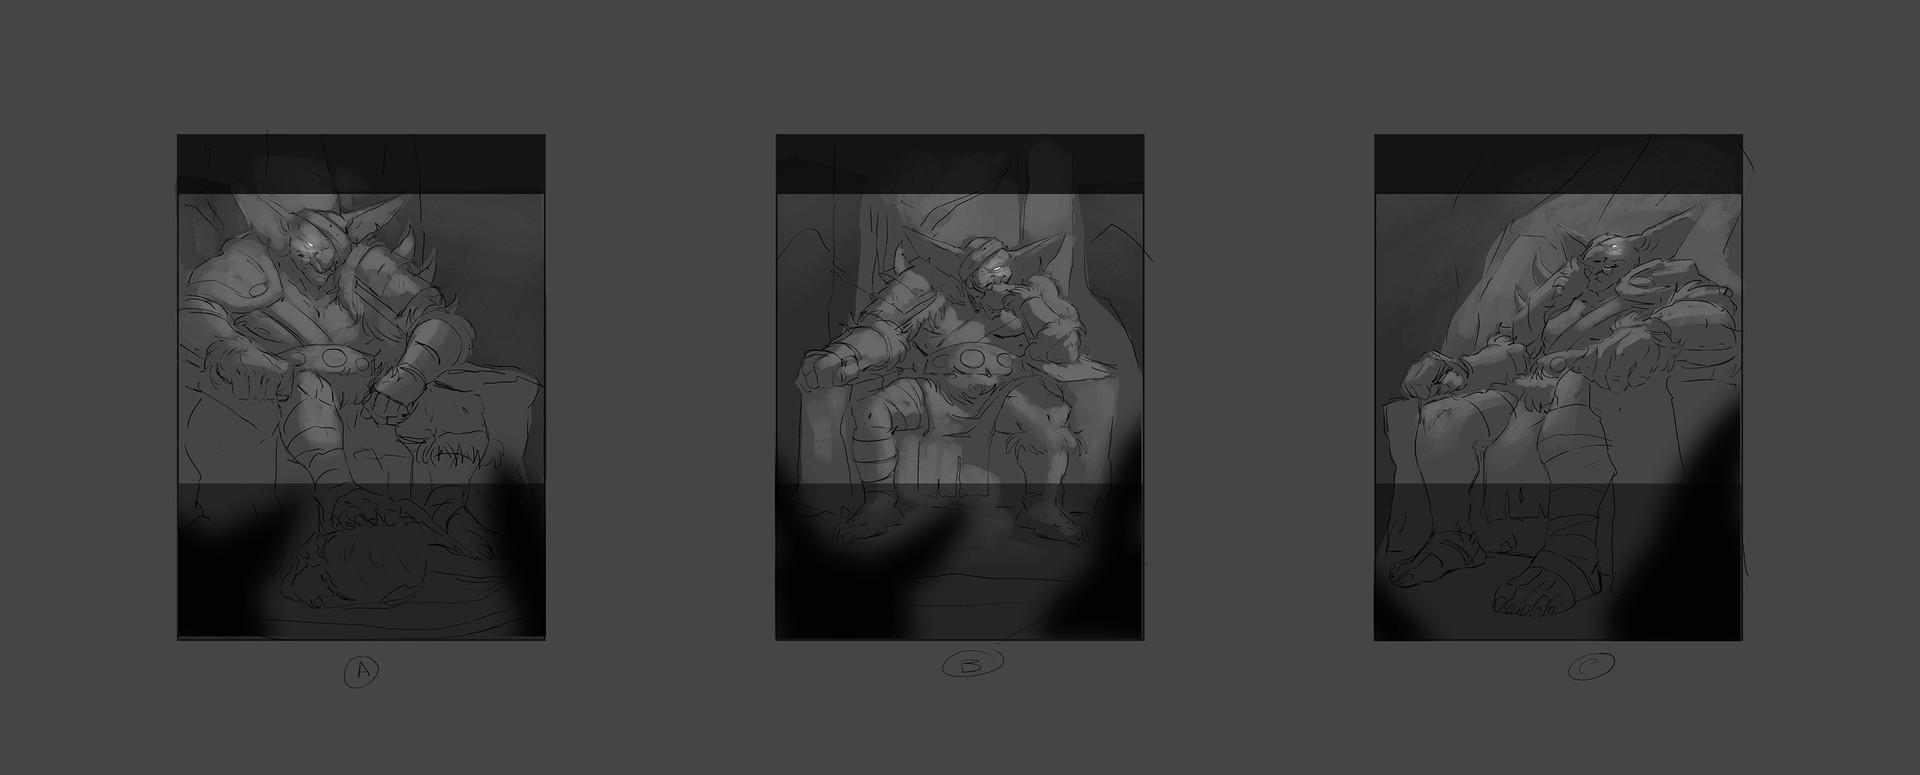 Ricardo coelho goblin king thumbnails 01